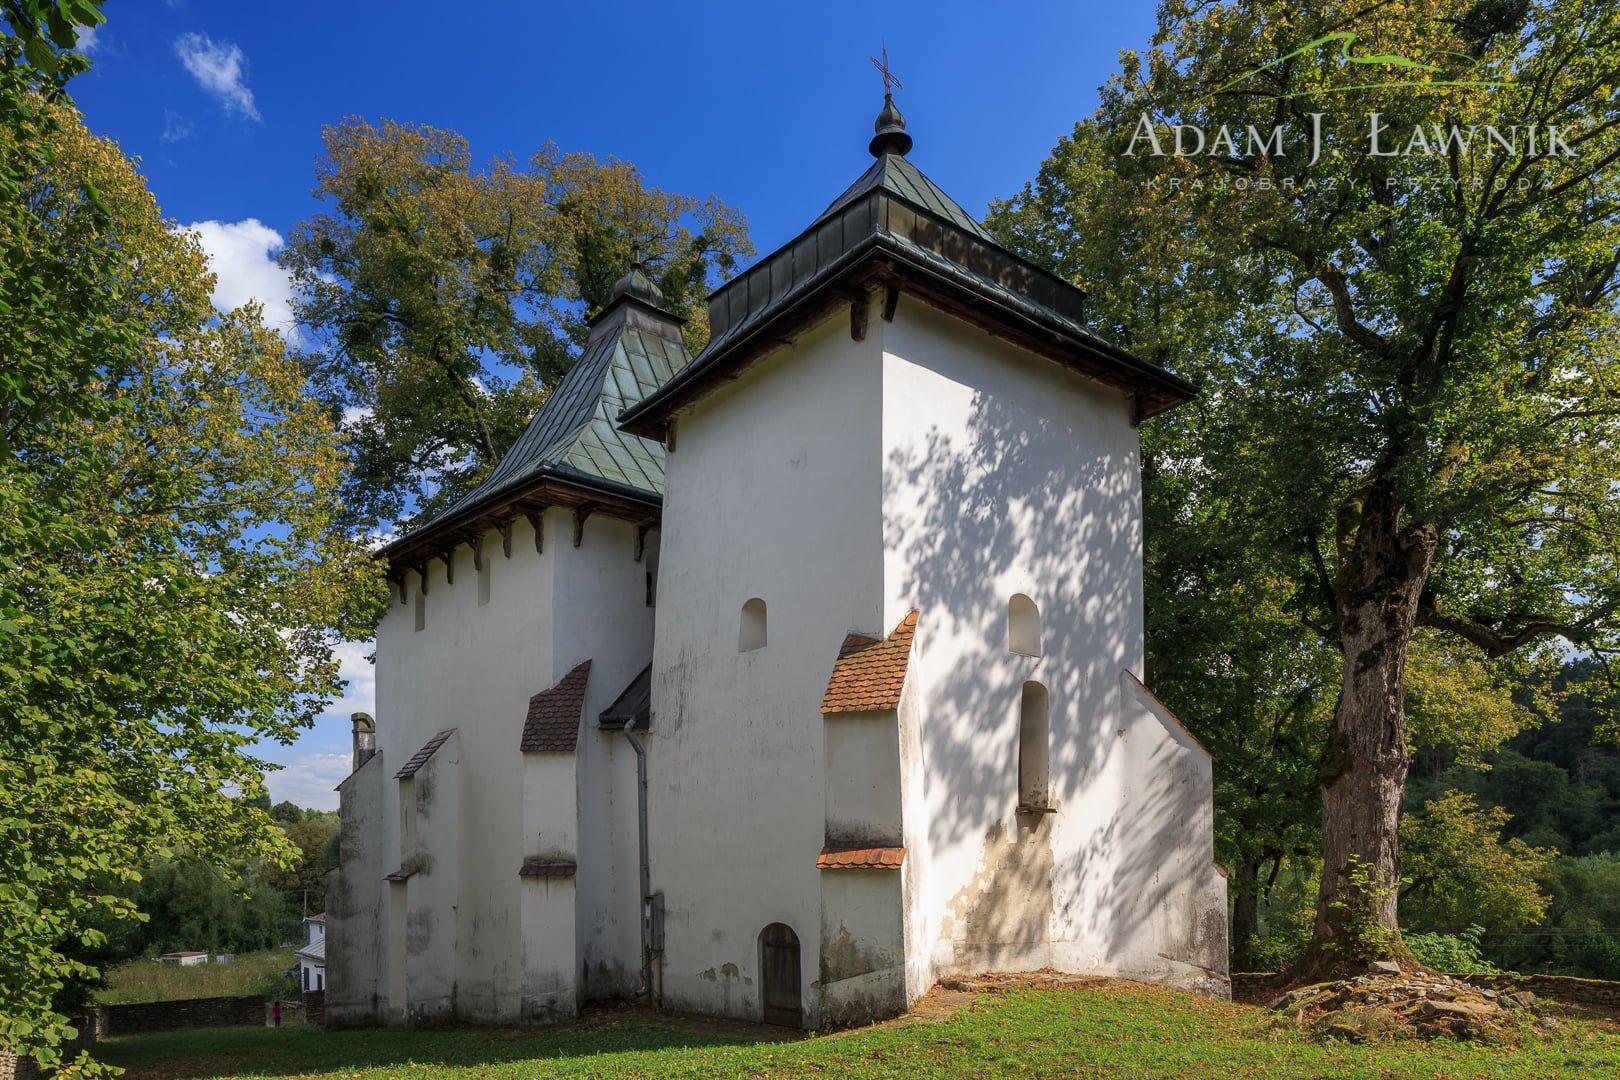 Turnica National Park, Poland 1308-01006C